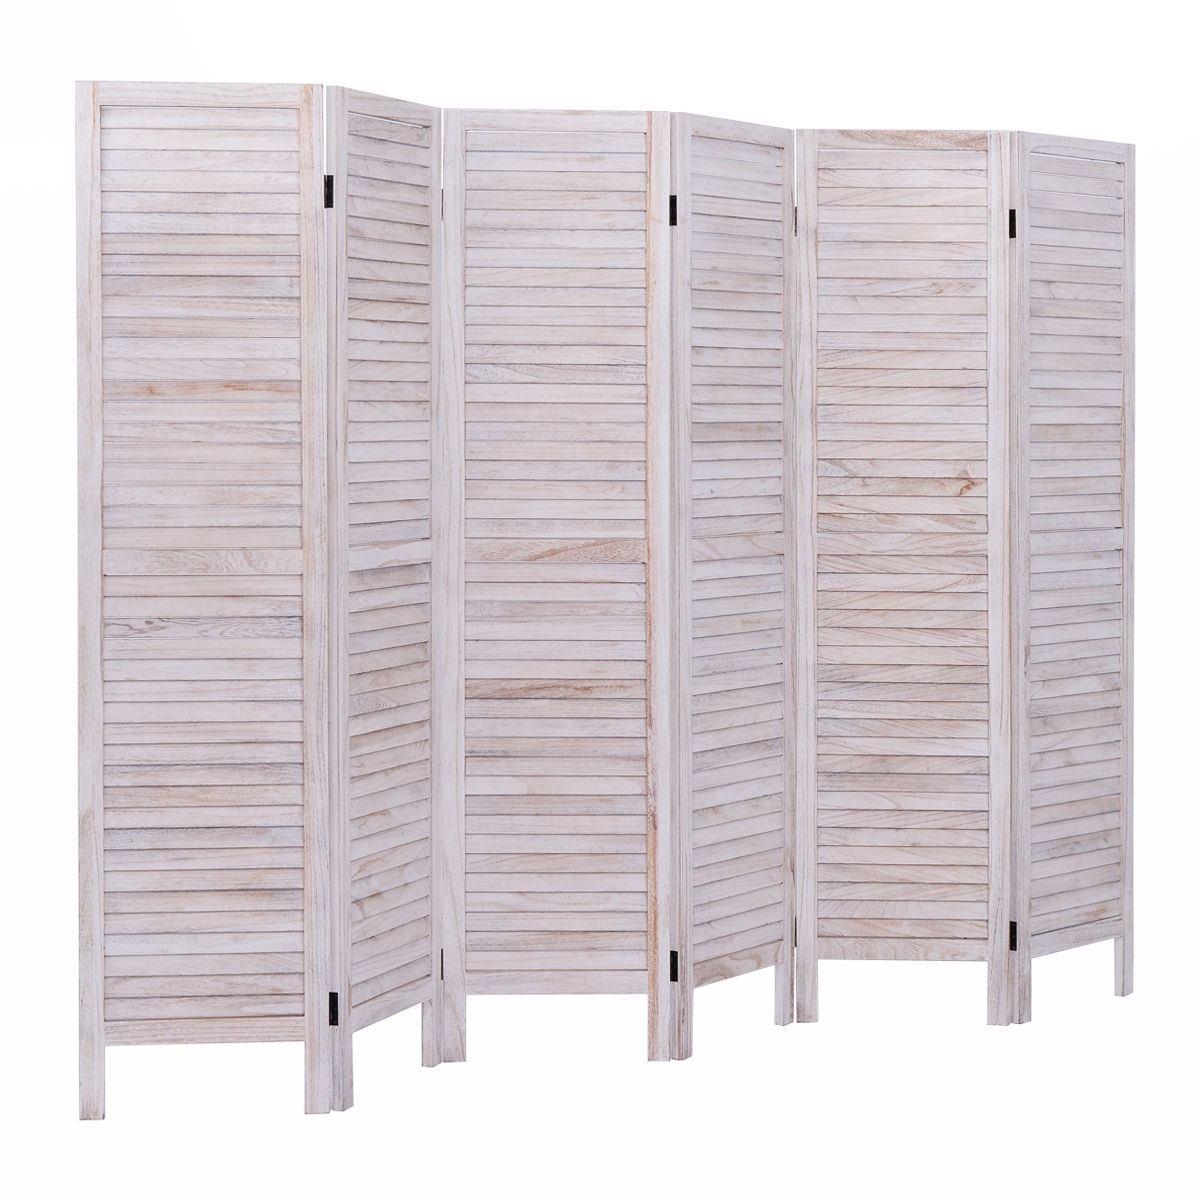 Alitop 6 Panel Room Divider Furniture Classic Venetian Wooden Slat Home 67 in.